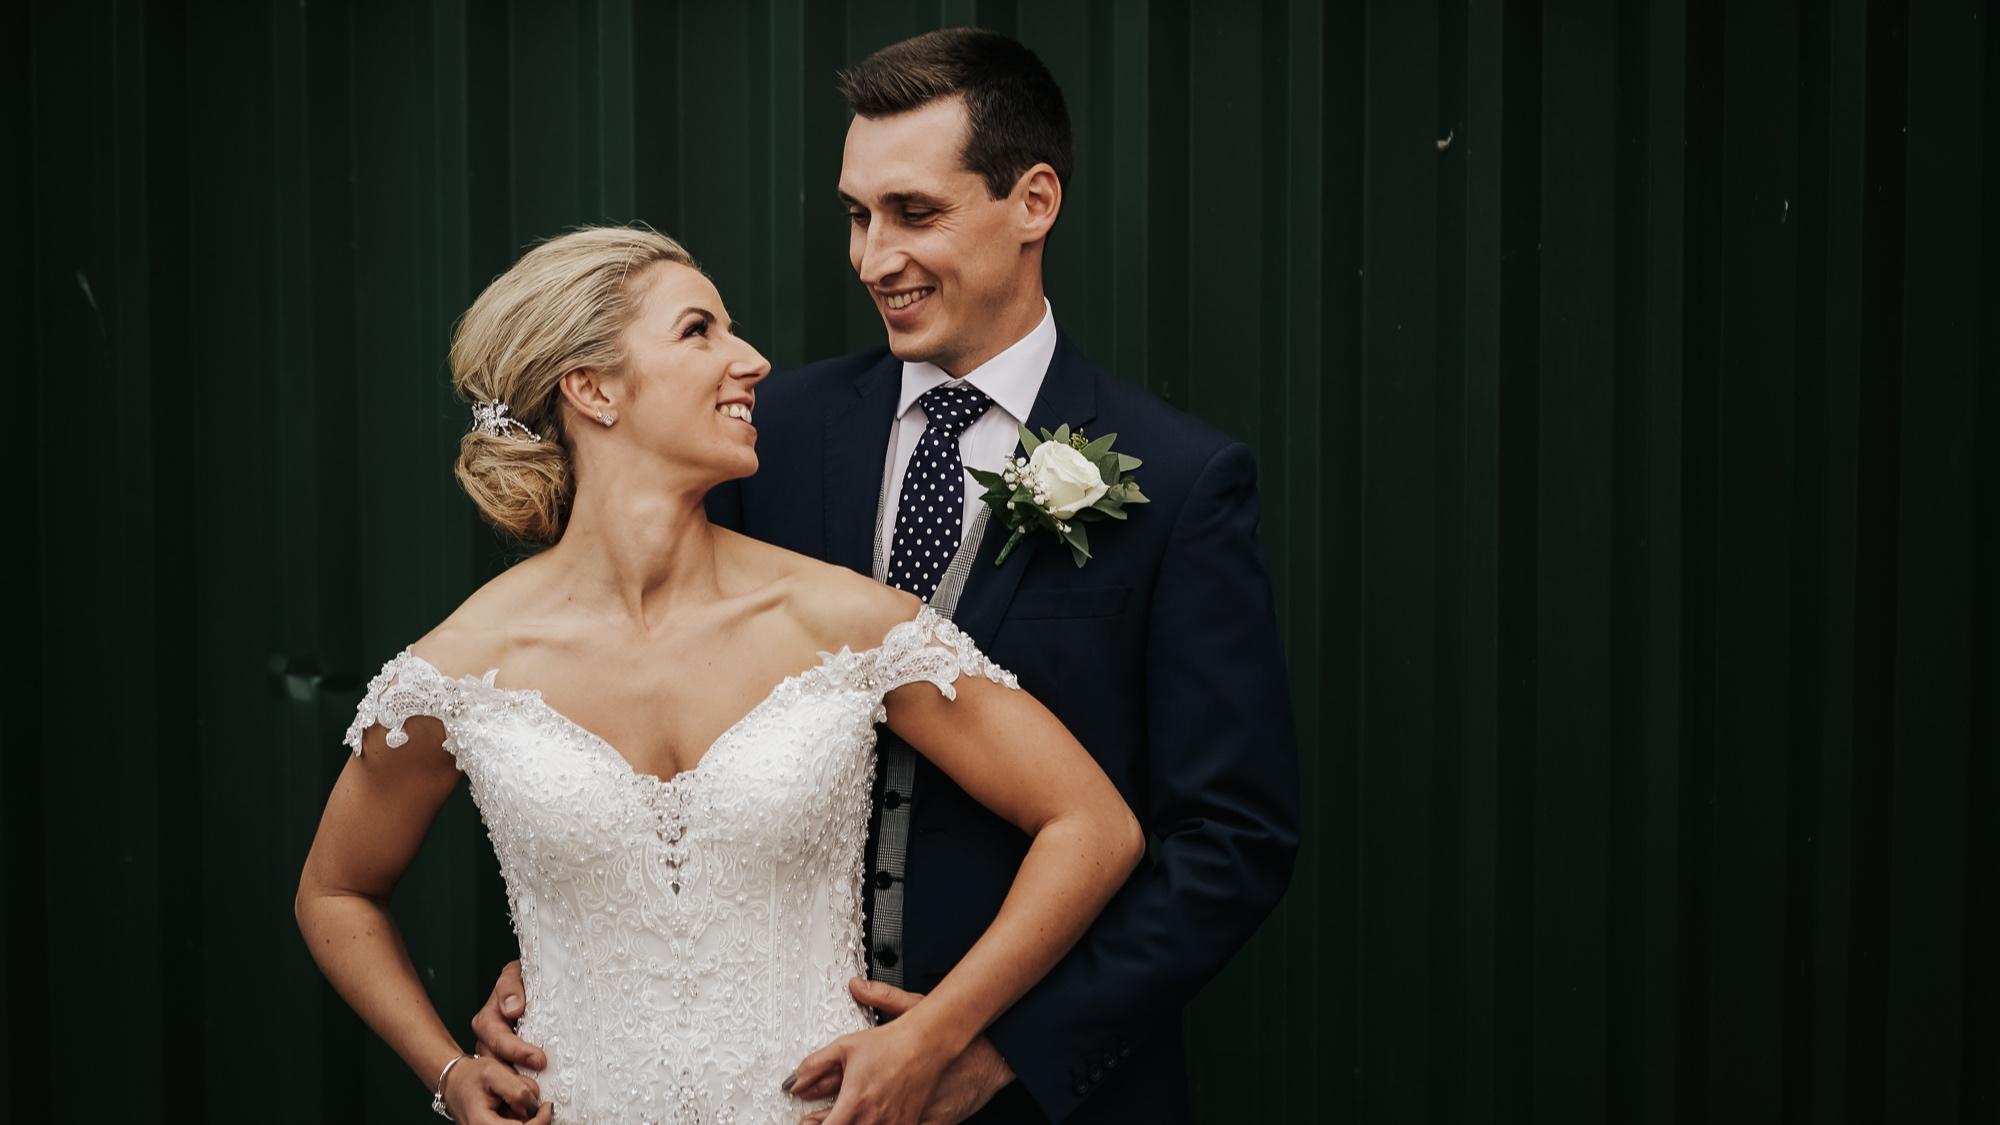 Sandhole+Oak+Barn+Wedding+Photography+cheshire+wedding+photographer+%2833+of+56%29.jpg